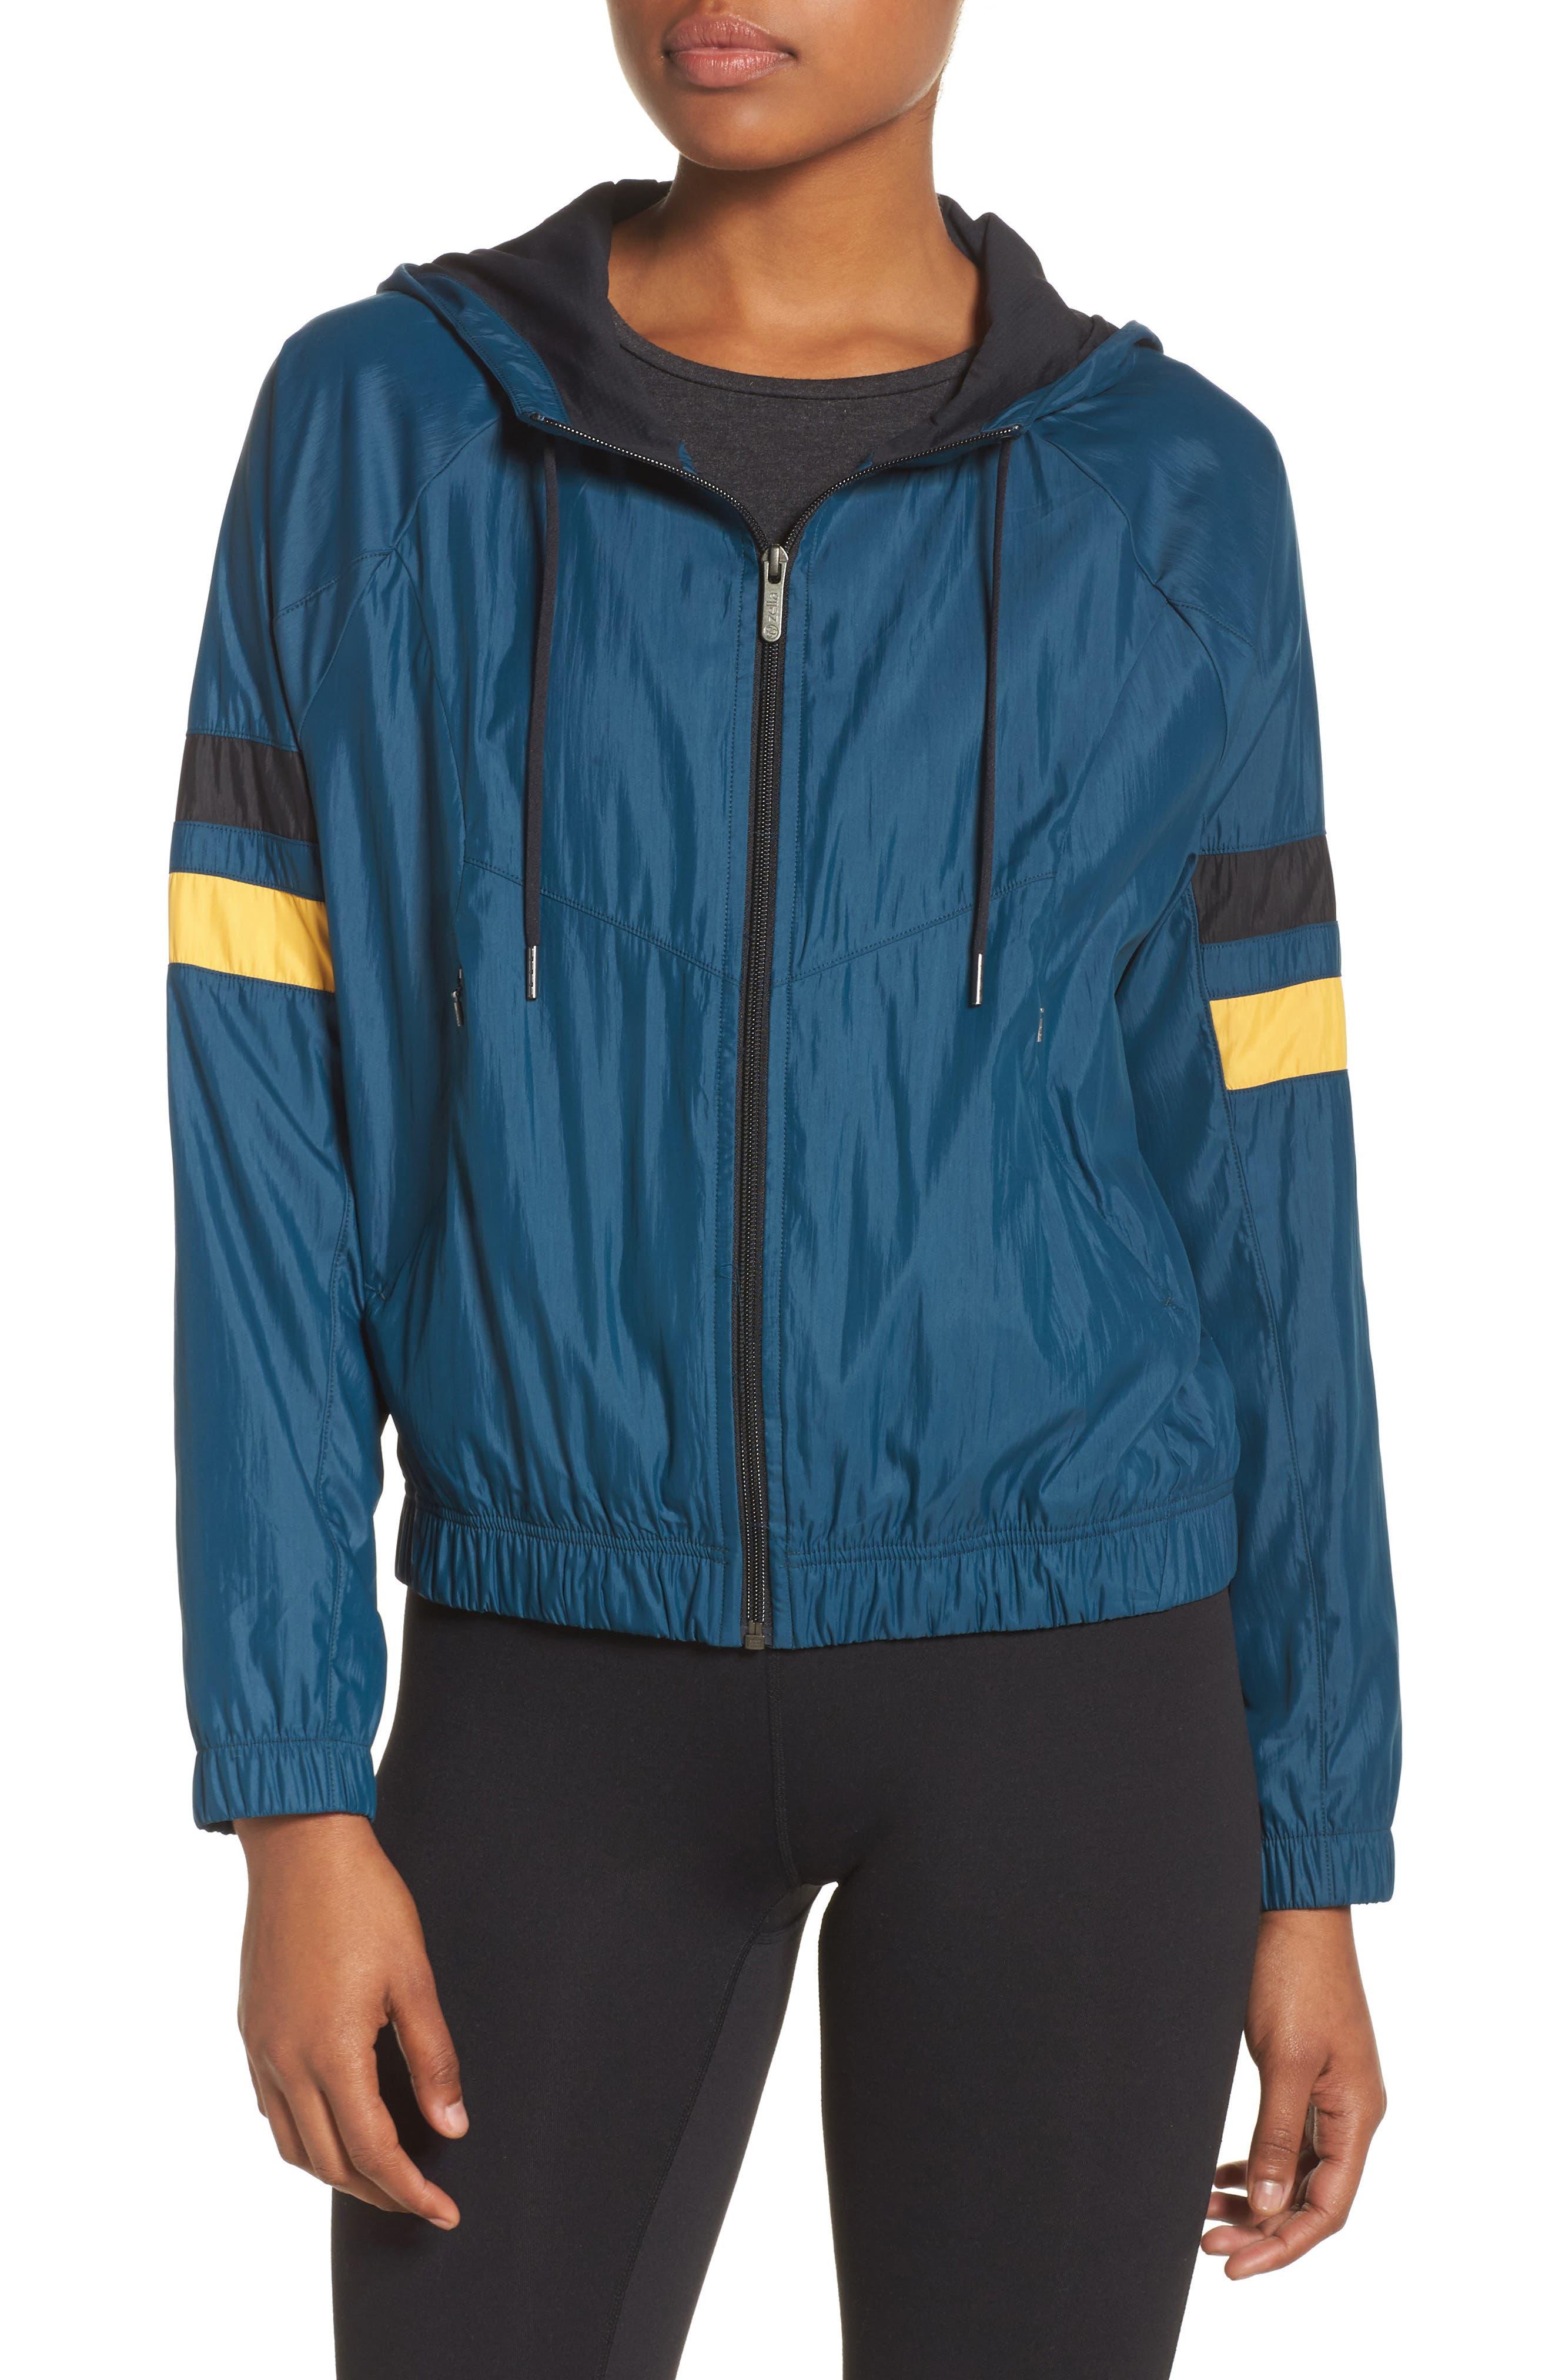 Main Image - Zella Style Game Colorblock Jacket